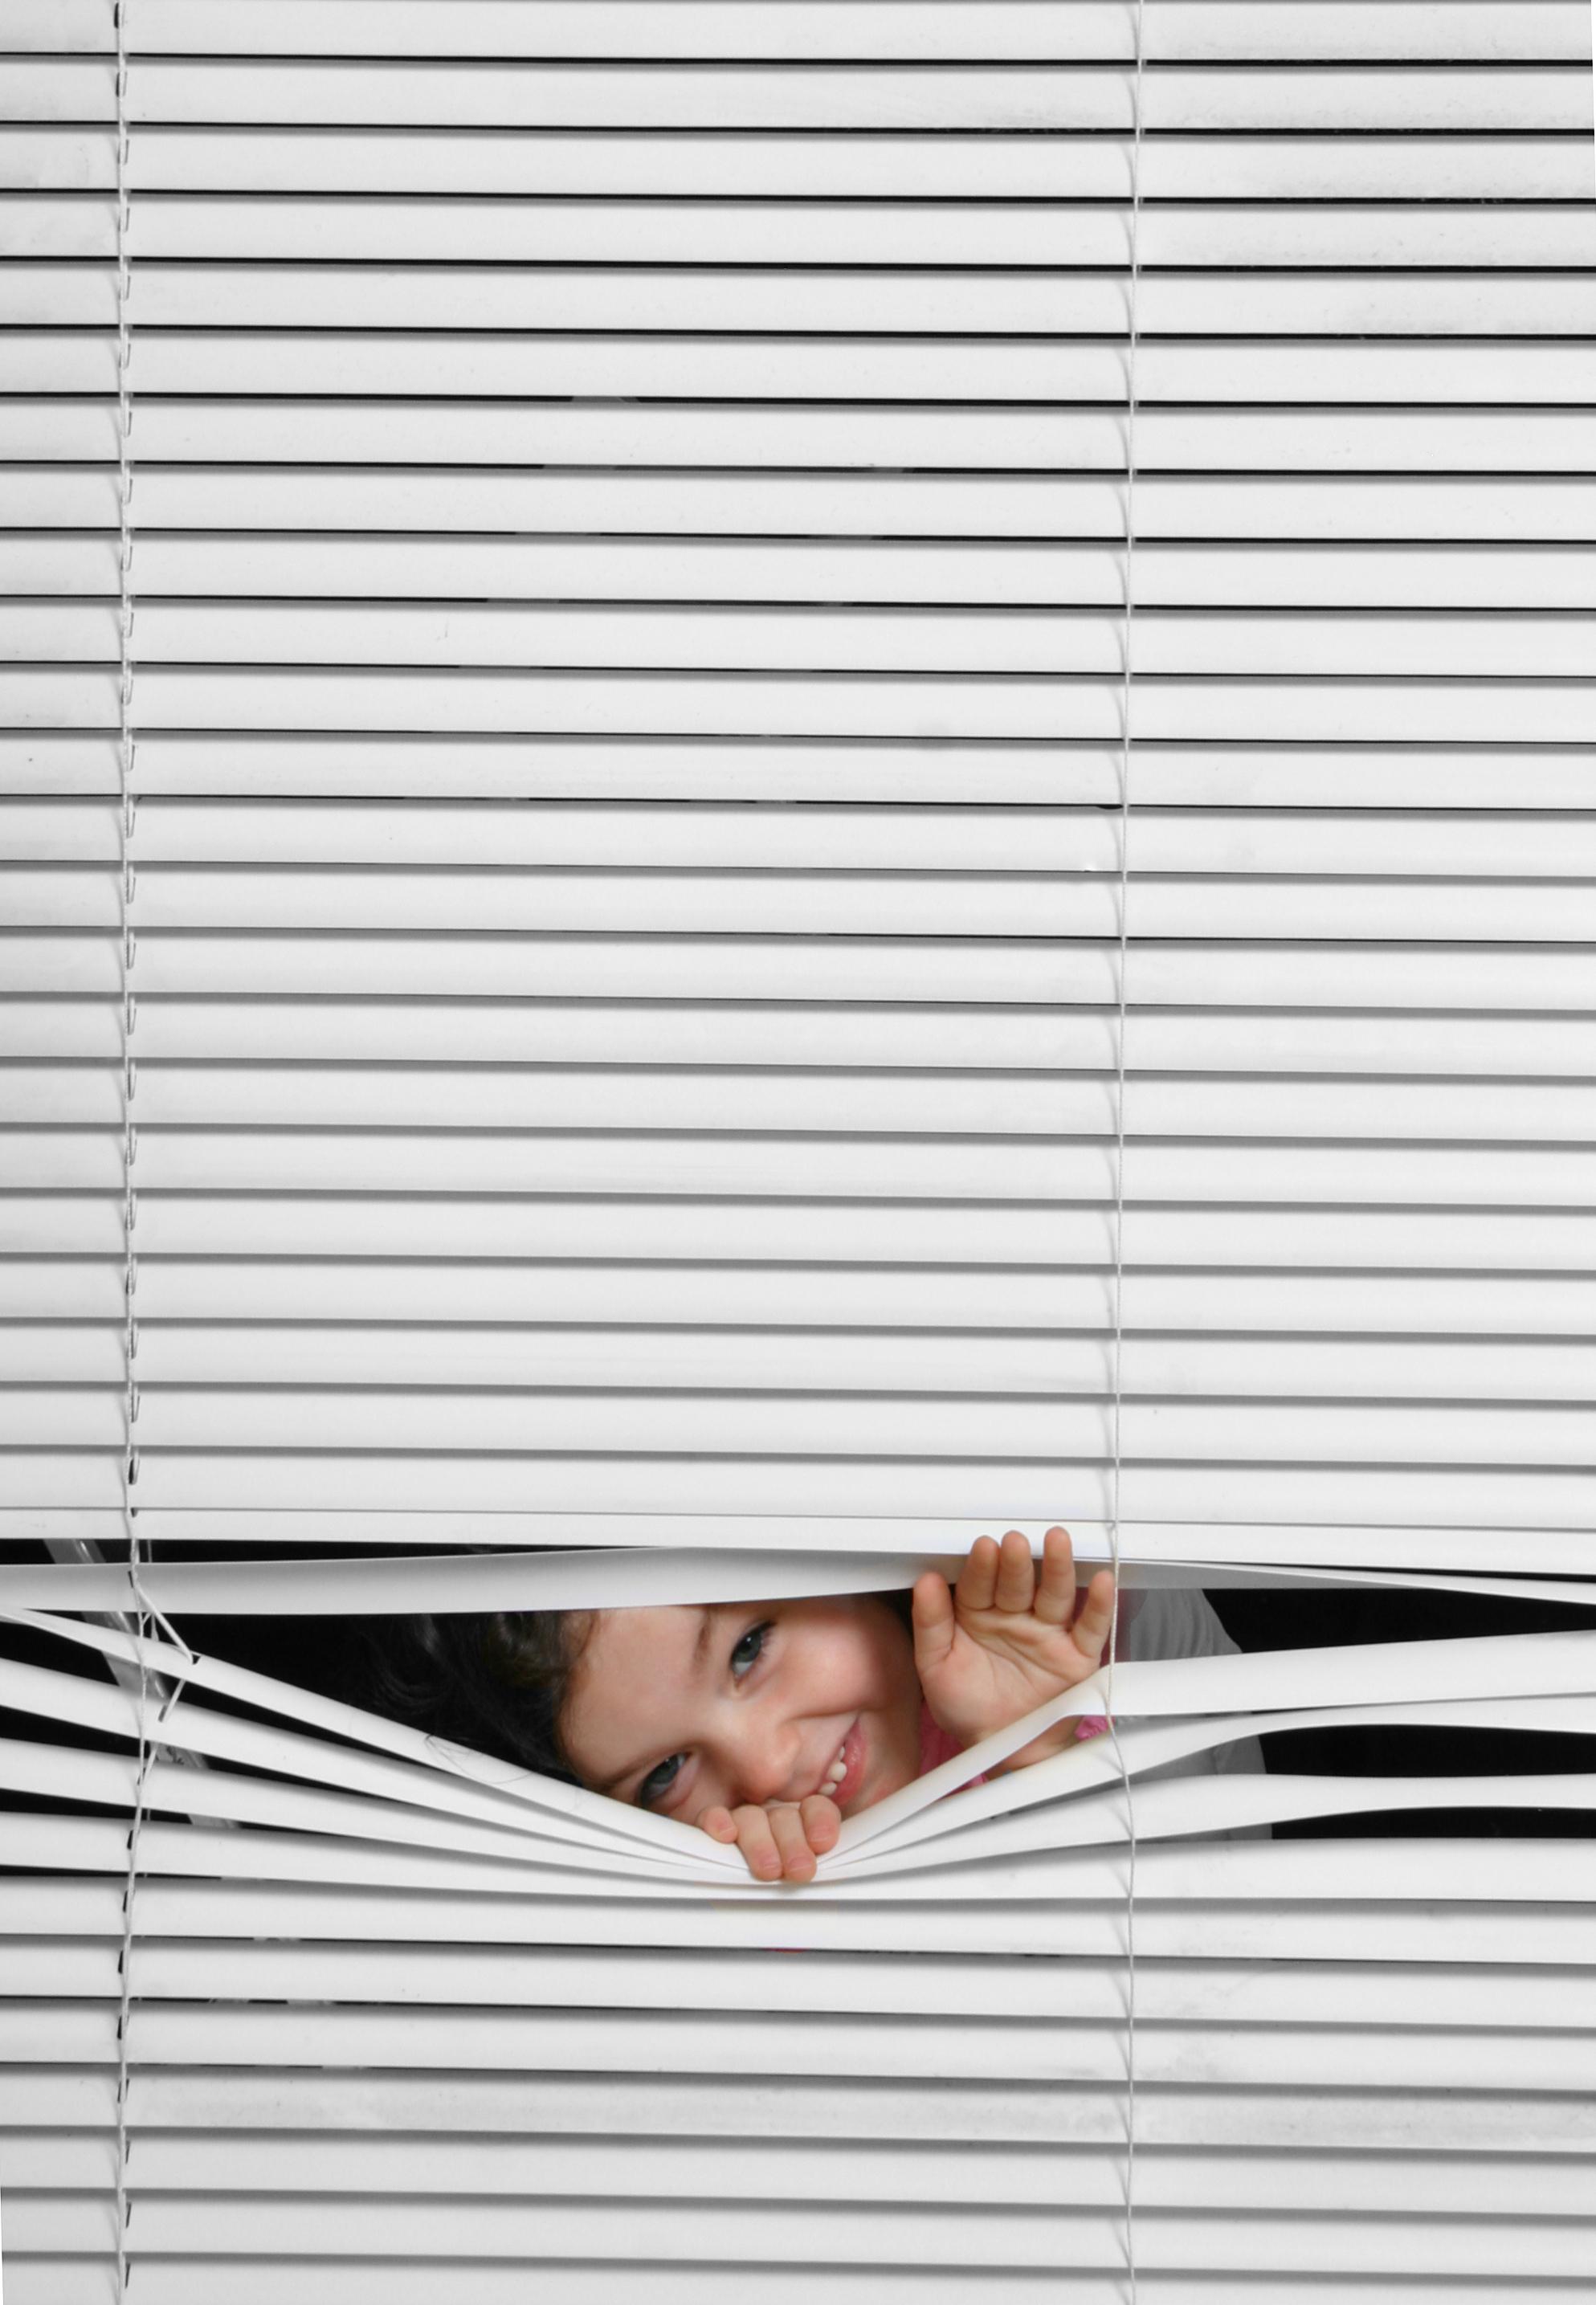 custom-mini-blinds-gallery-of-shades.jpg